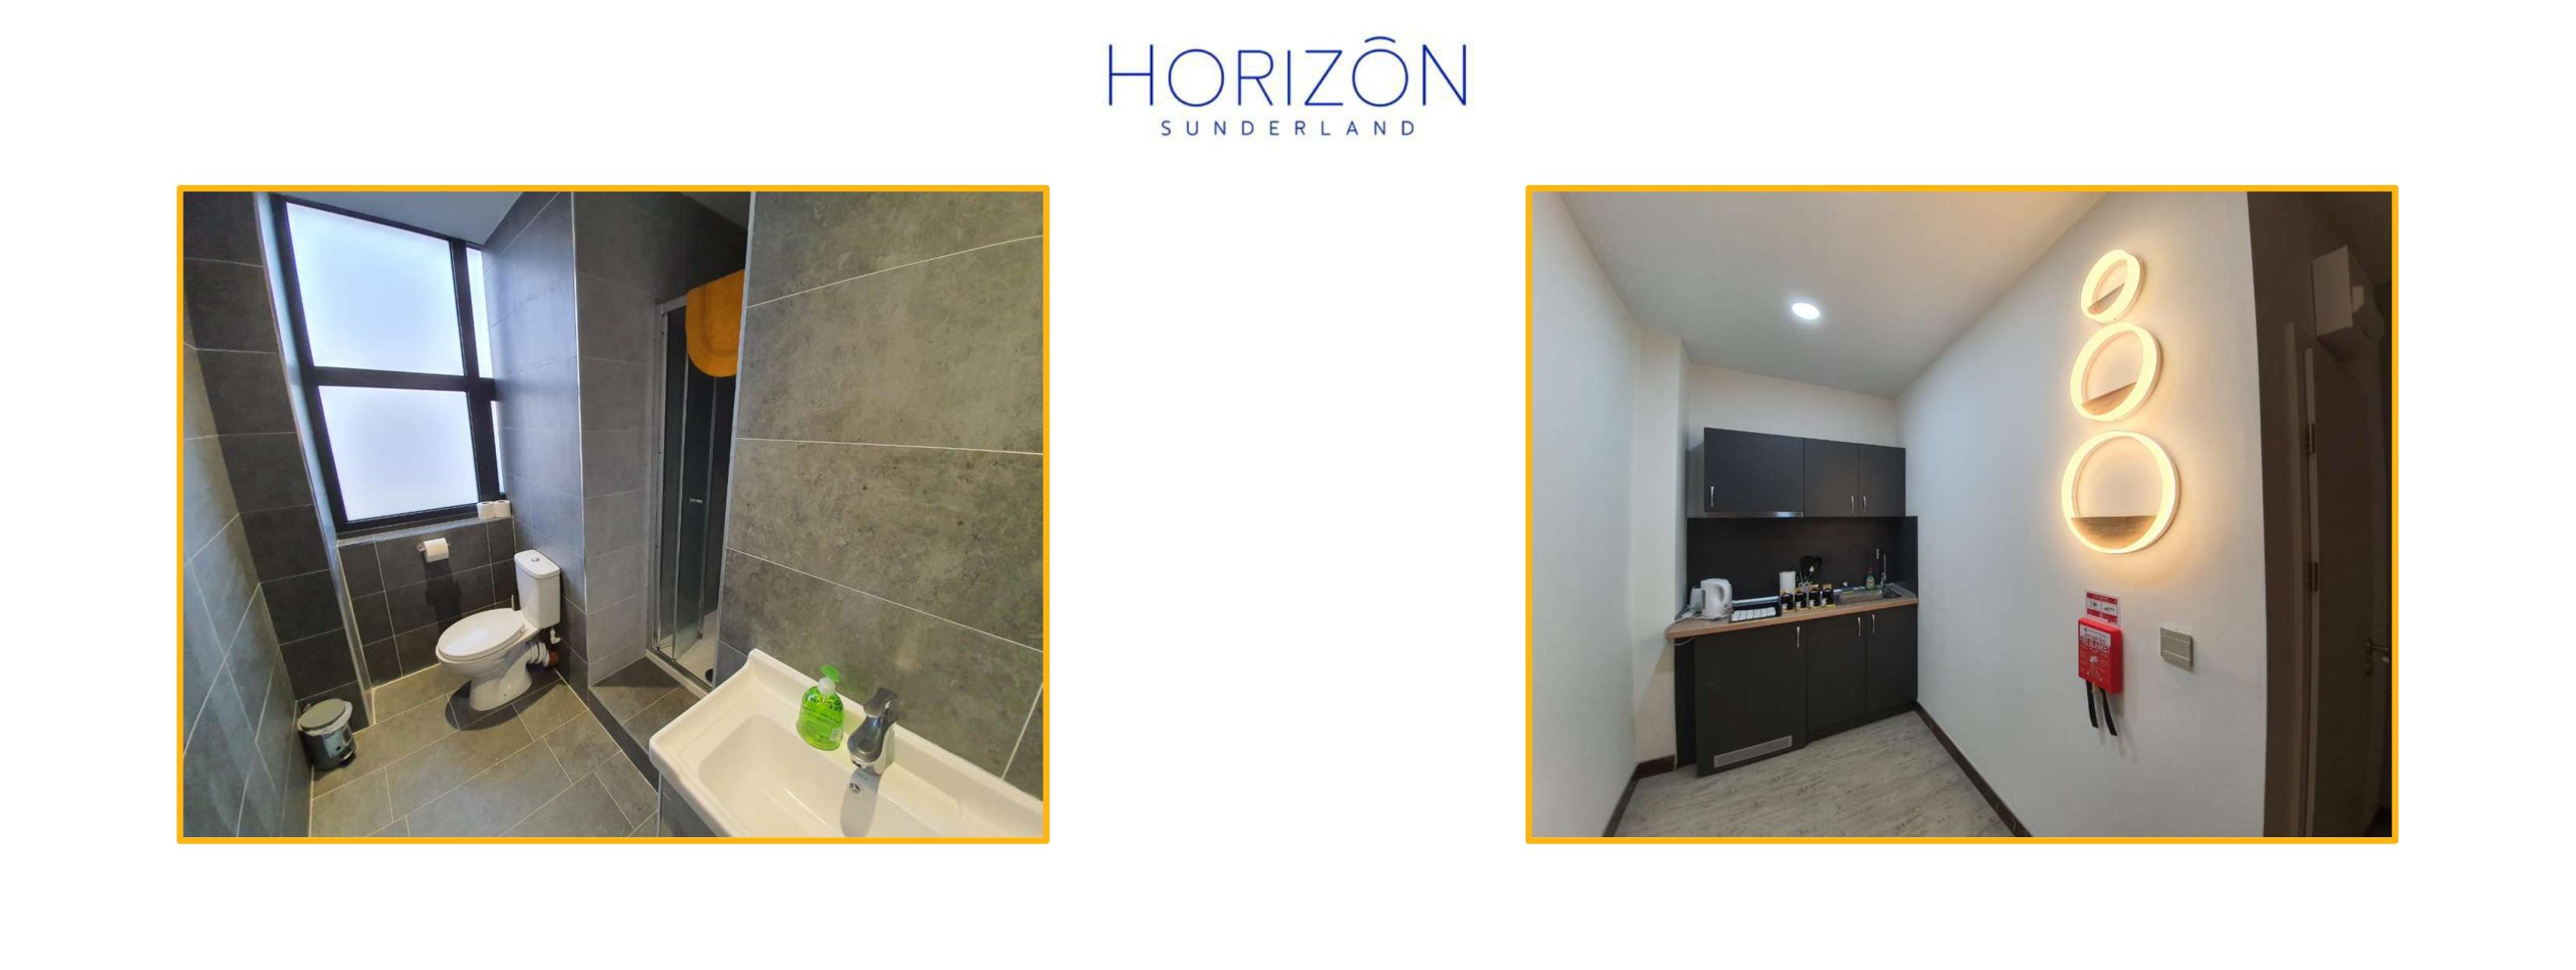 Horizon Sunderland -Ahmet Ziyal_v02_page-0007